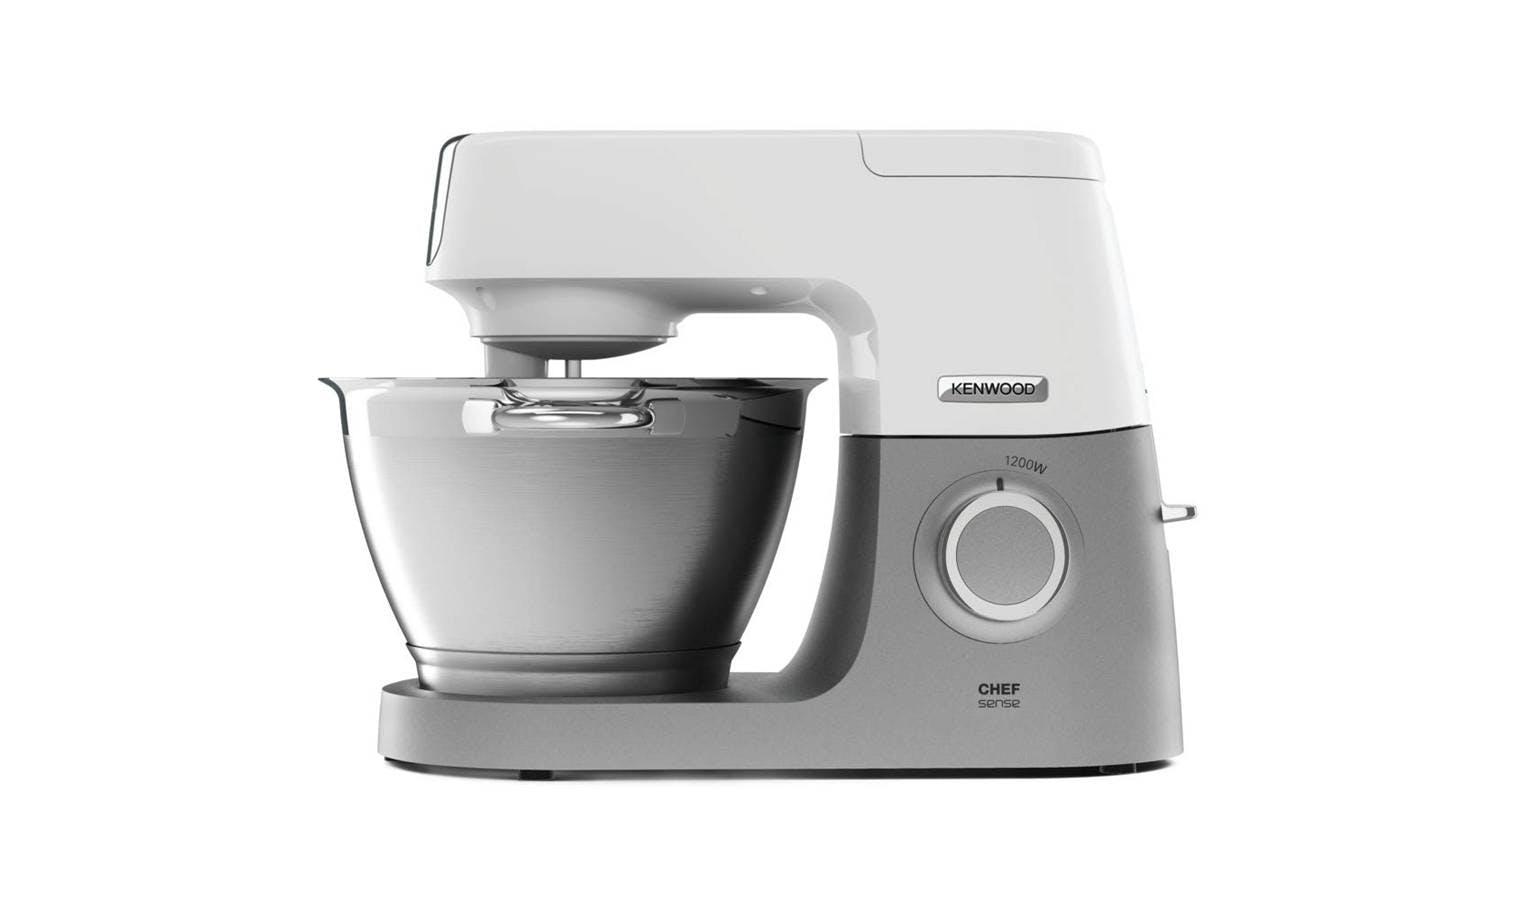 Kenwood Kvc5100t 4 6l Chef Sence Kitchen Machine 1200w Silver White